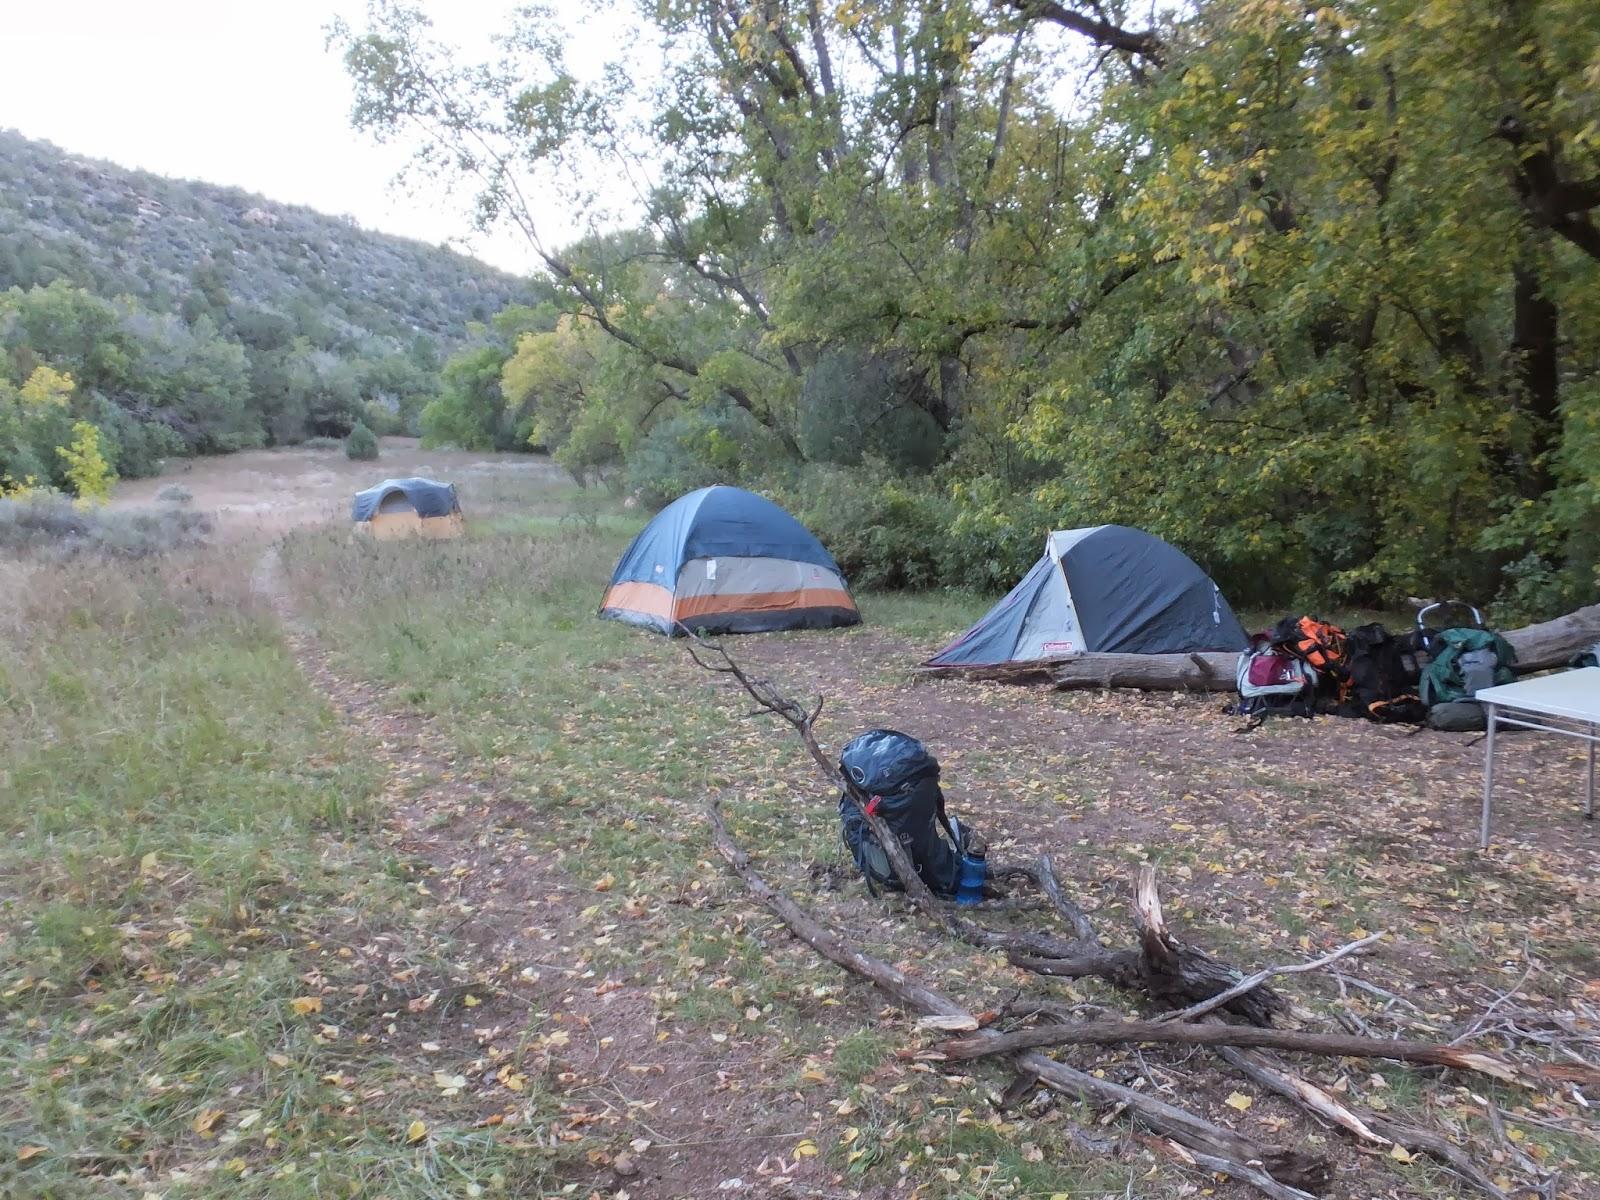 Man Cave New Mexico : New mexico camping las huertas canyon sandia man cave